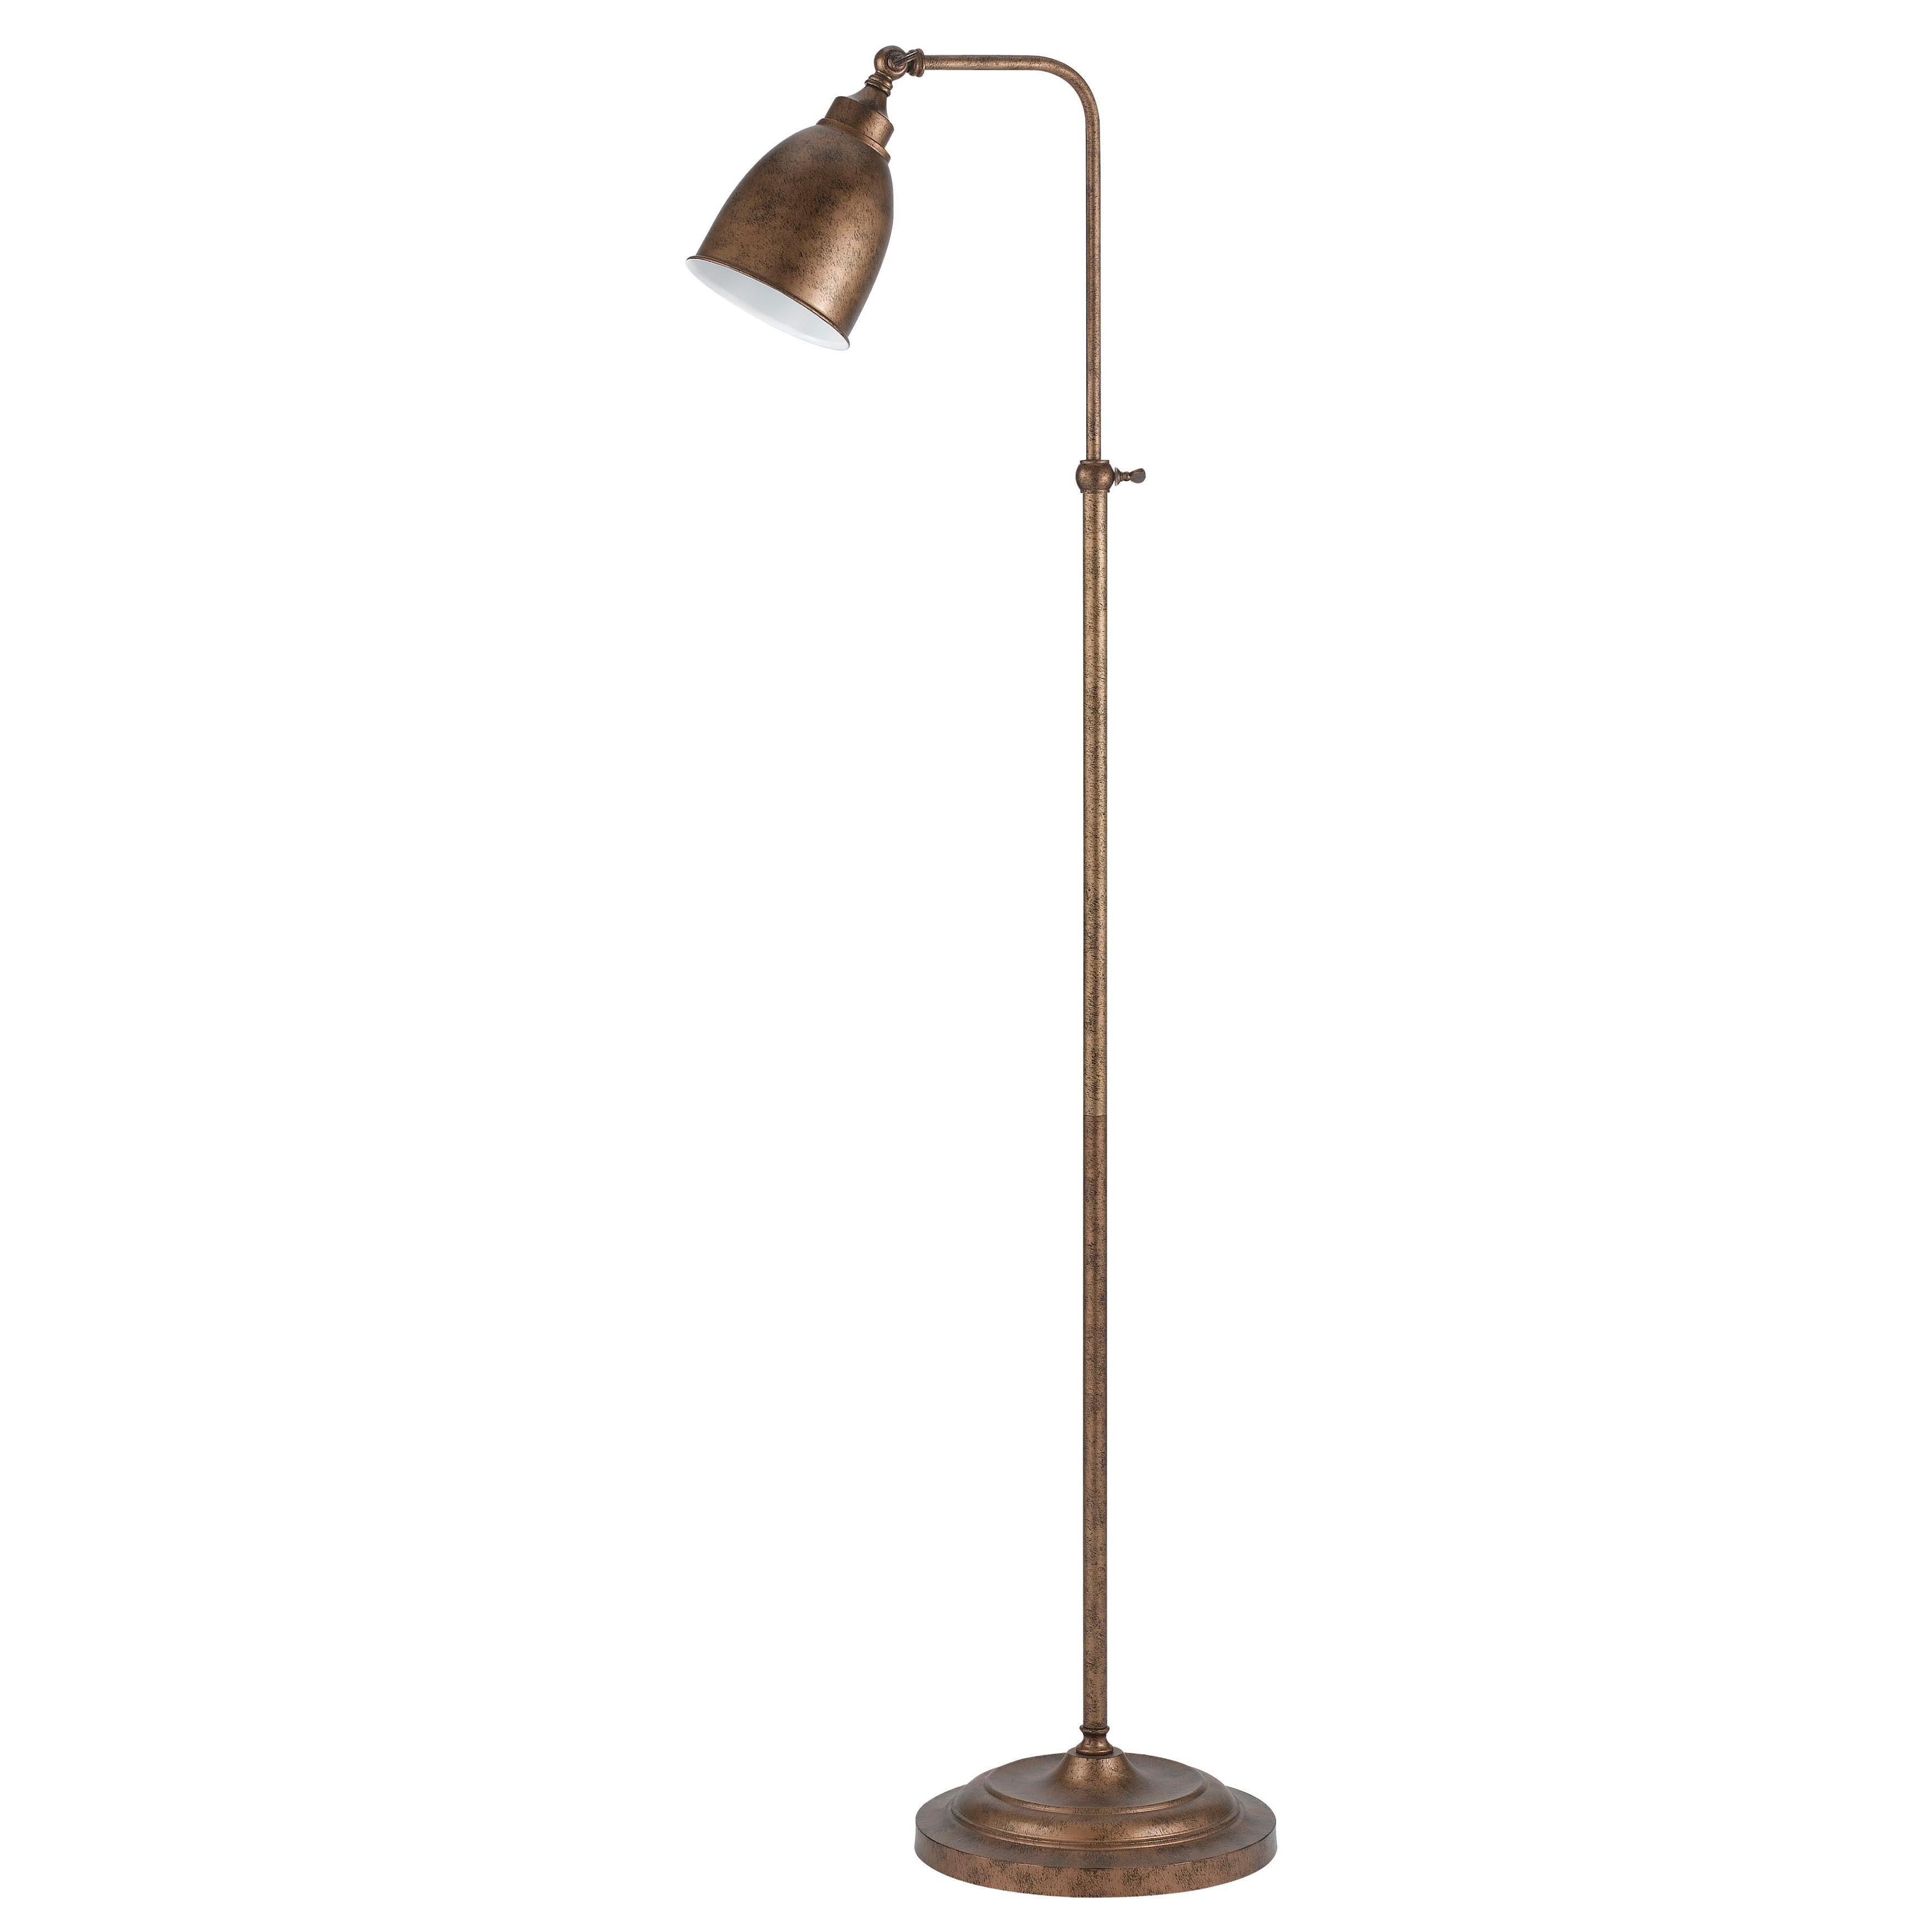 Cal Lighting B0 2032fl Pharmarcy Pole Floor Lamp Free Shipping Today 7345125